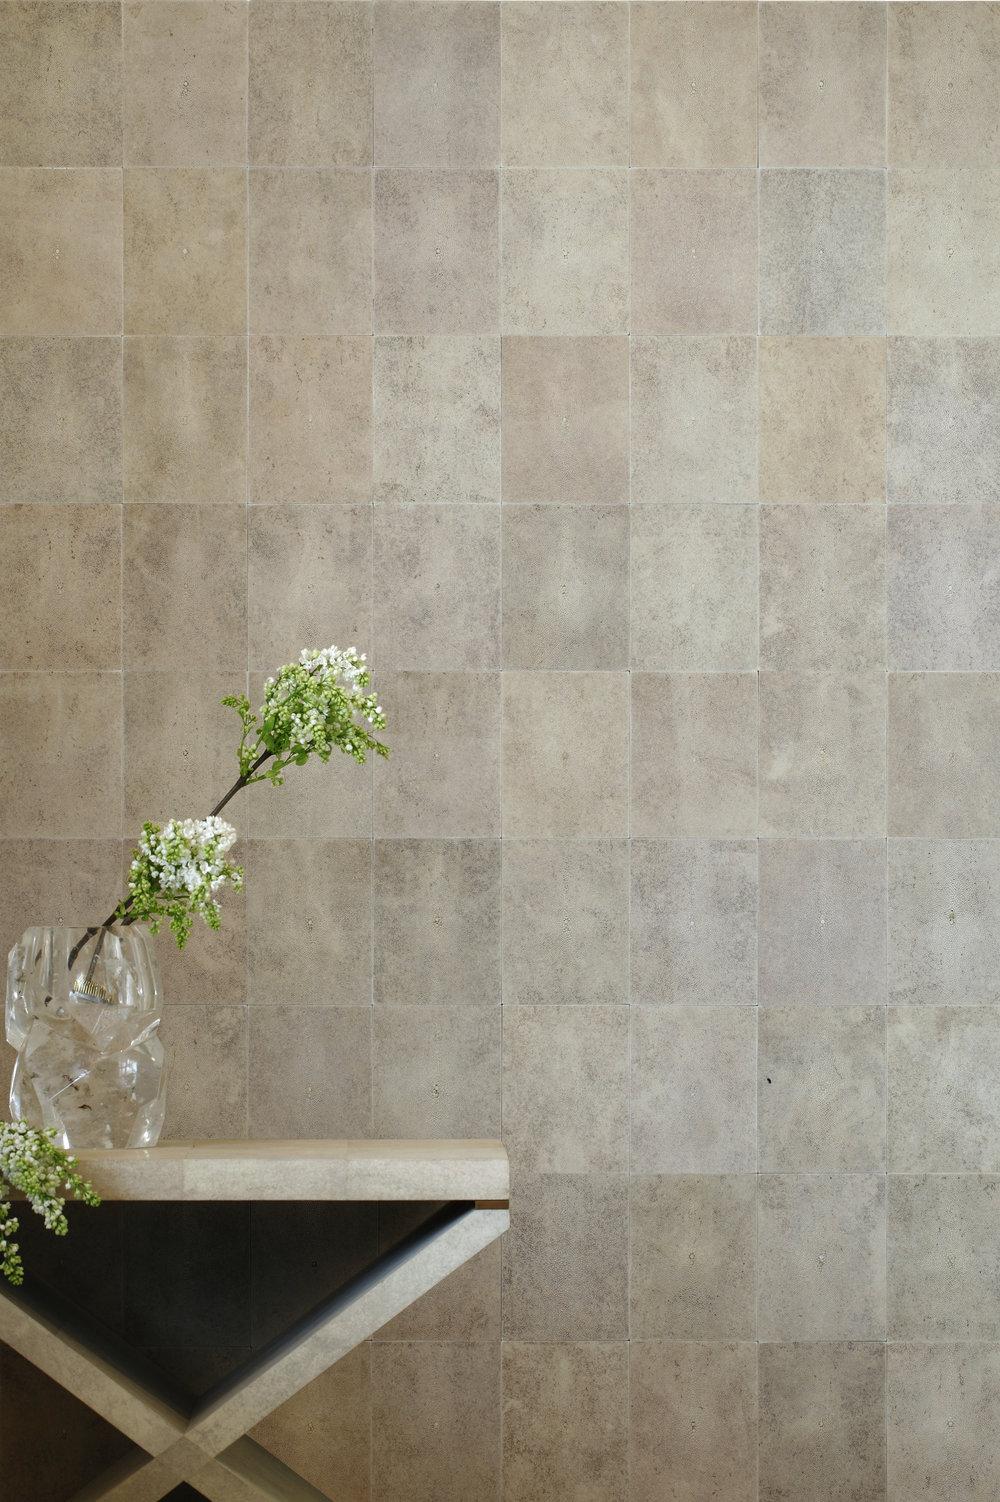 alexander_lamont_wall_panel_perle_natural_speckle_shagreen.JPG